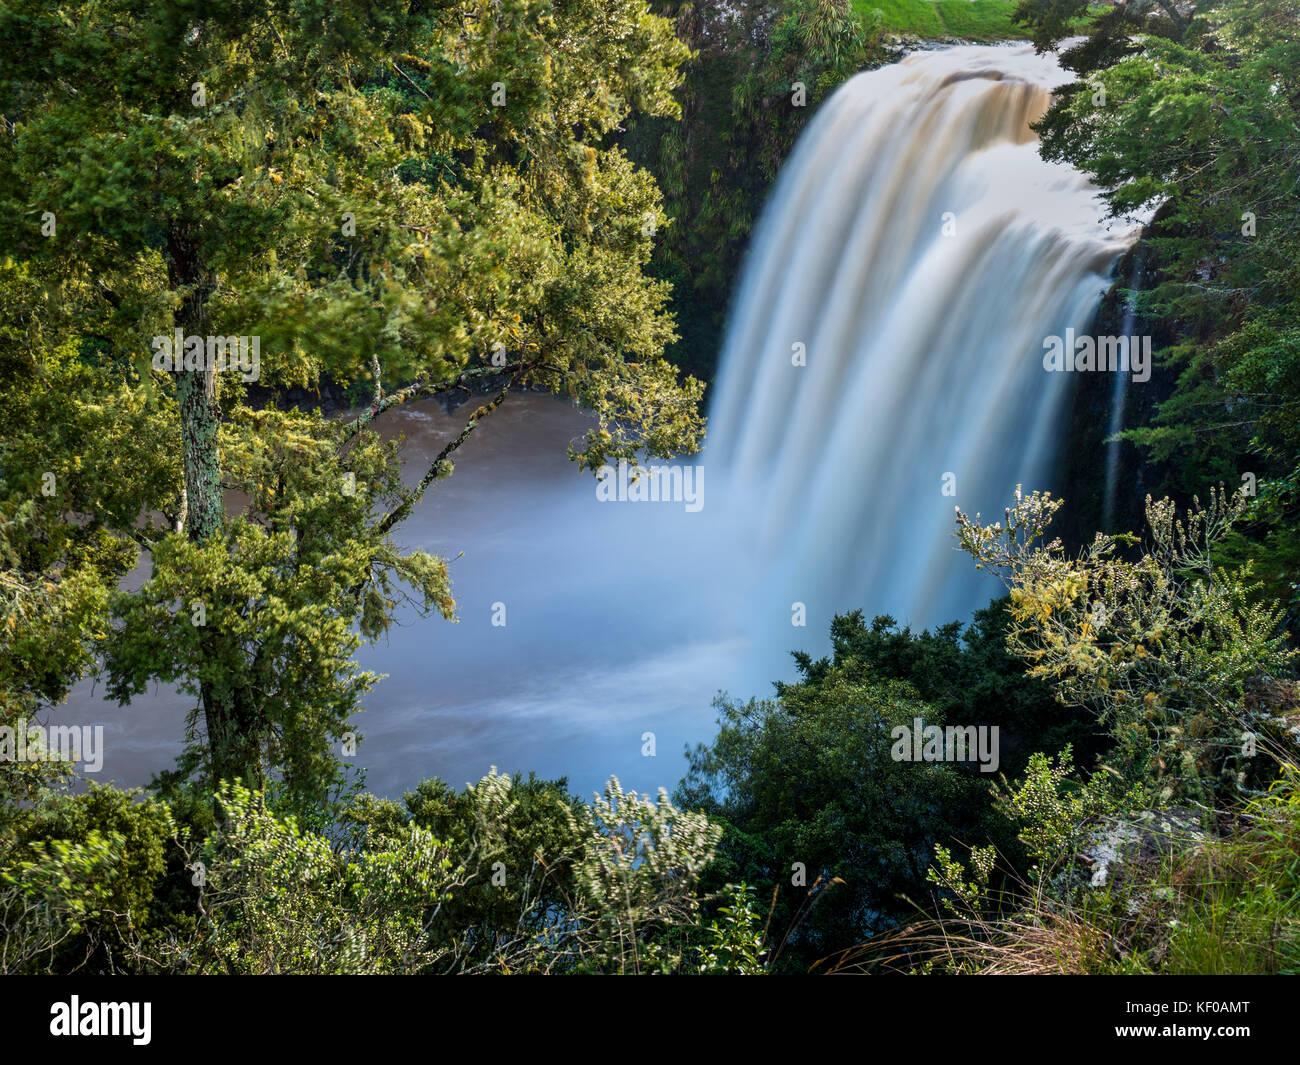 New Zealand, North Island, Whangarei Falls - Stock Image